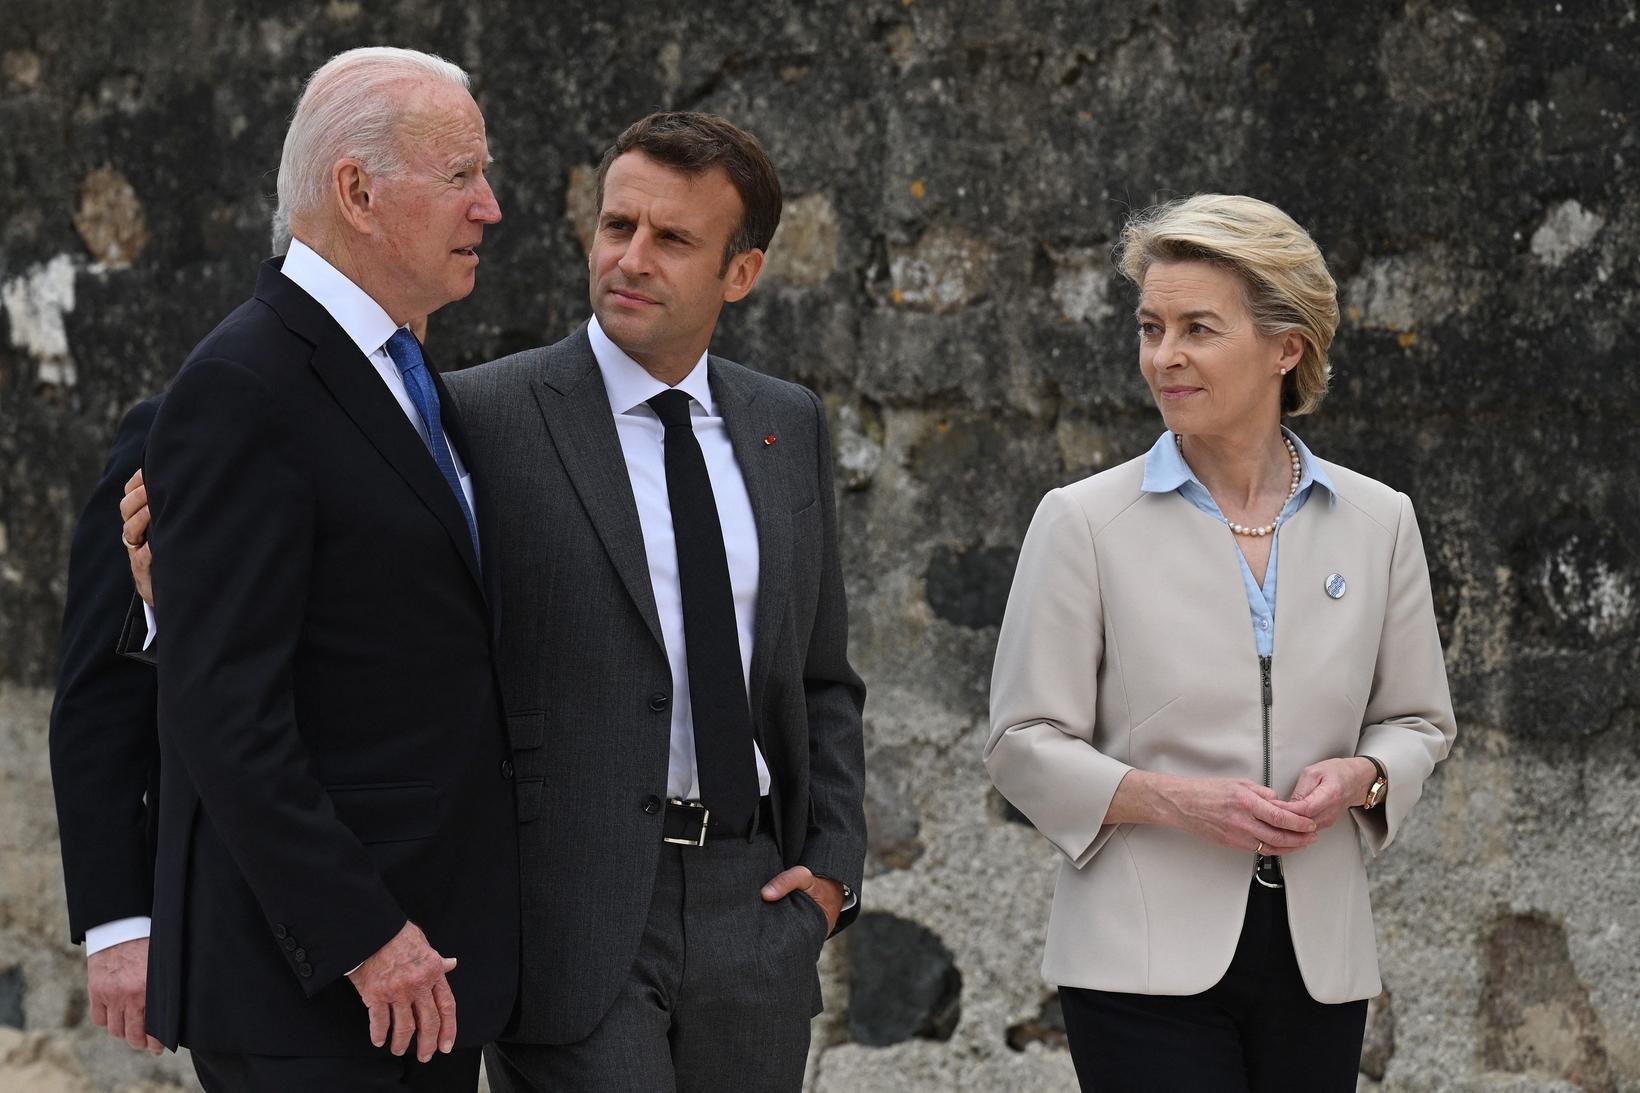 Joe Biden, forseti Bandaríkjanna, Emmanuel Macron, forseti Frakklands og Ursula …